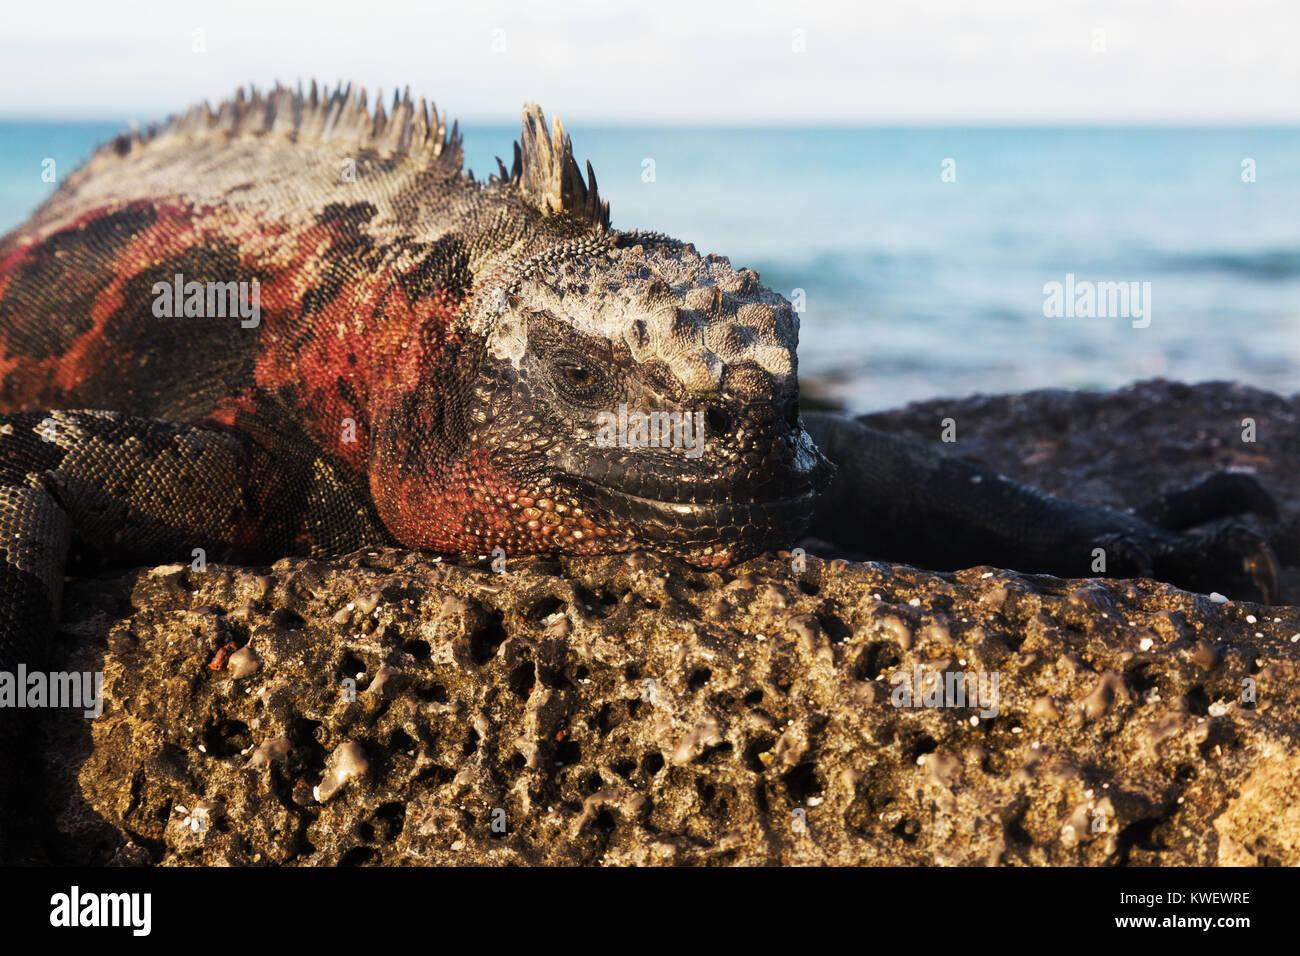 marine-iguana-amblyrhynchus-cristatus-ma